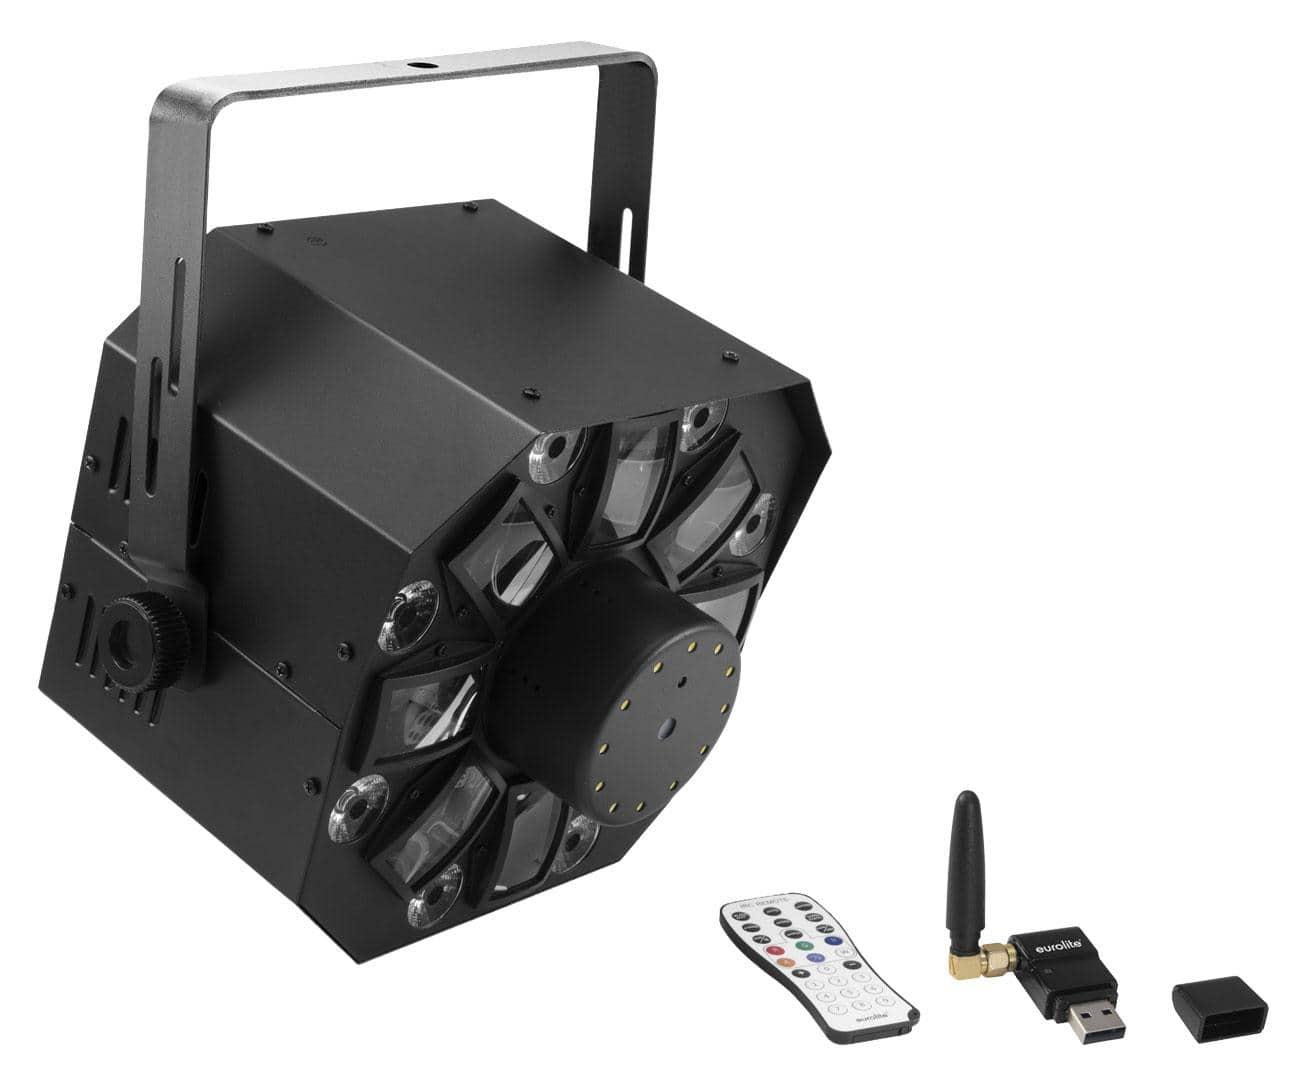 Lichtsets - Eurolite LED FE 1750 Hybrid Laserflower QuickDMX Set - Onlineshop Musikhaus Kirstein